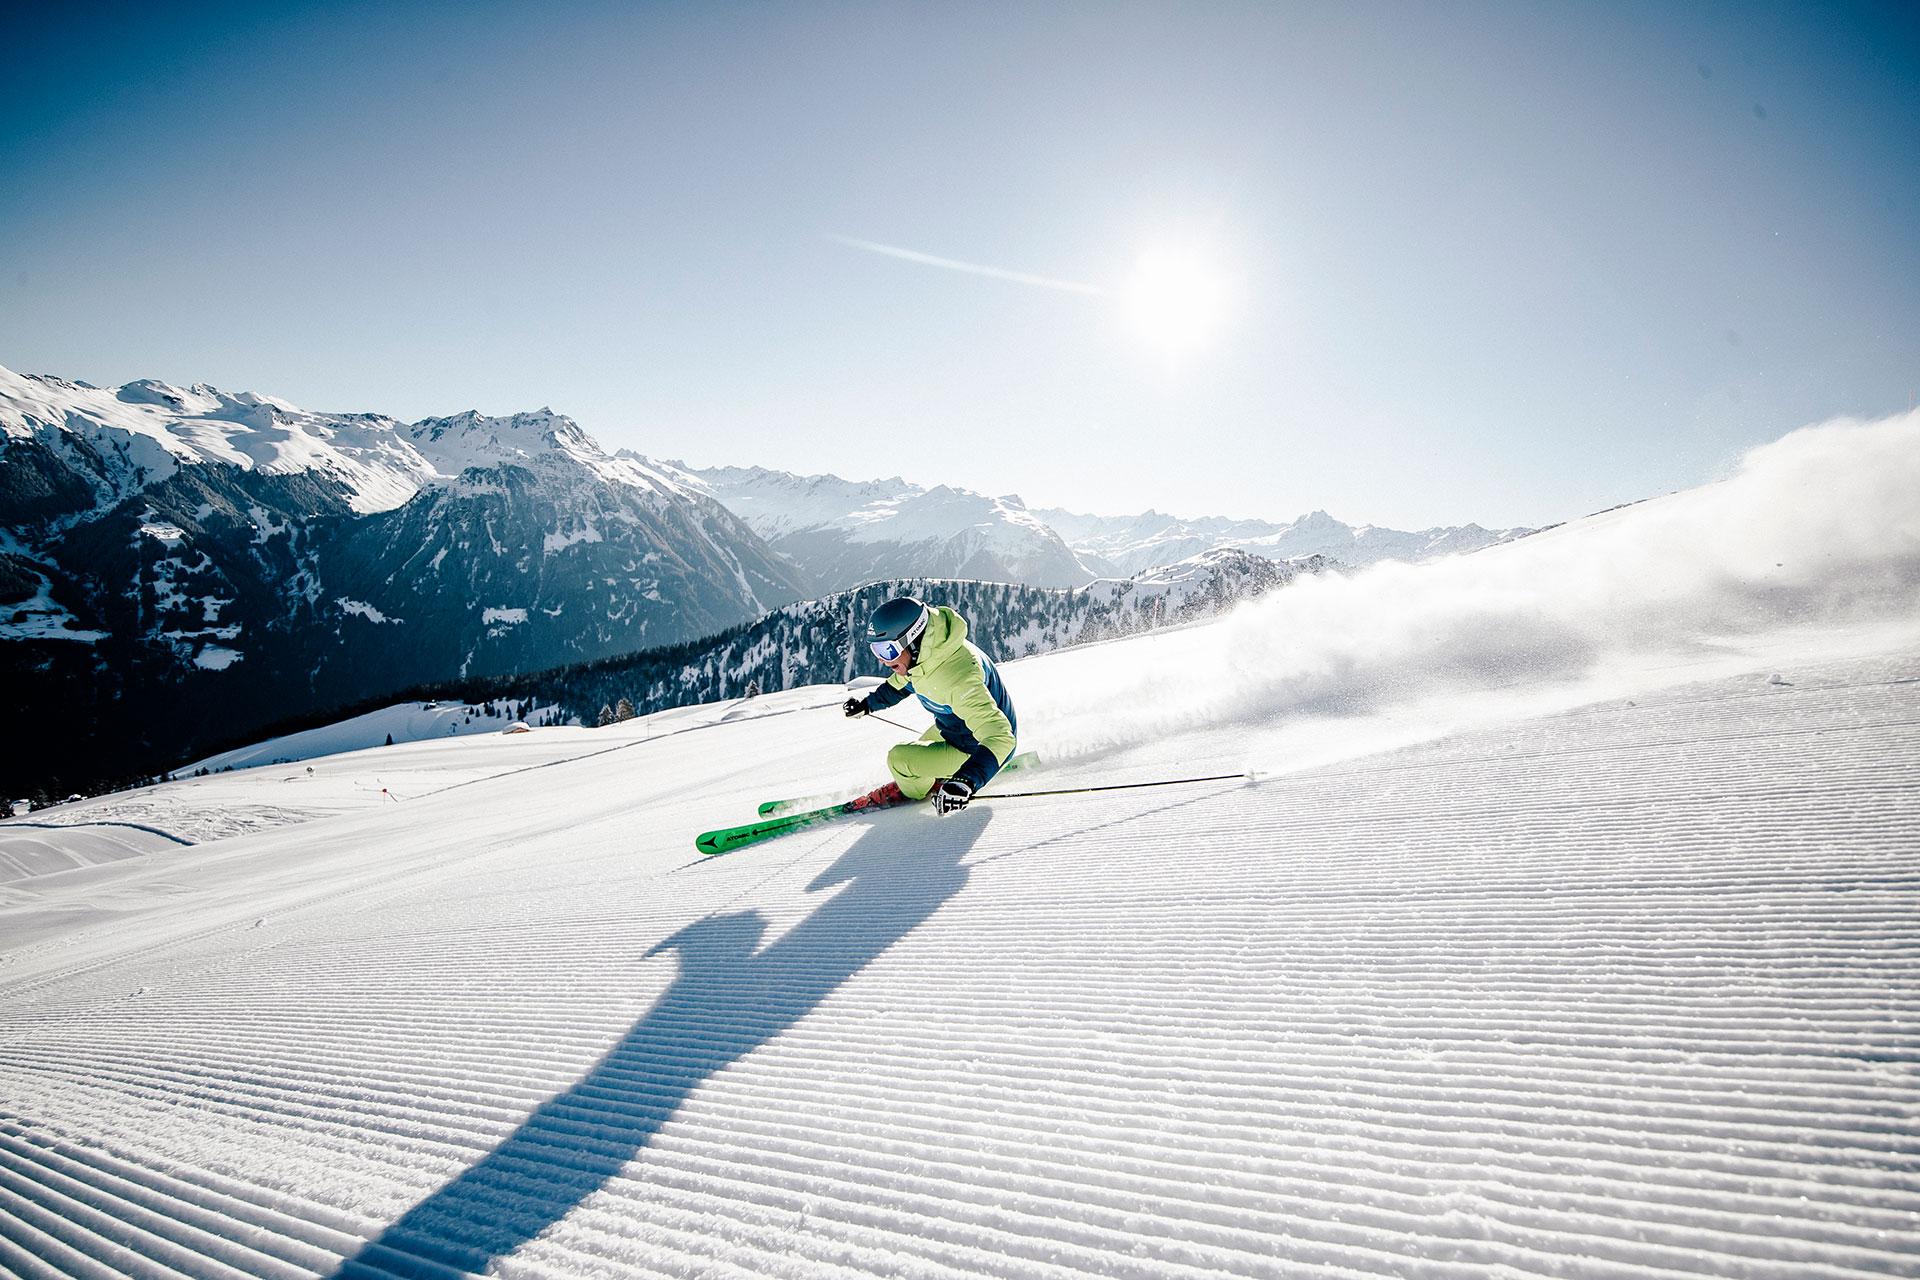 Benni Raich Skifahrer Fotograf Alpin Fotoproduktion München Salzburg